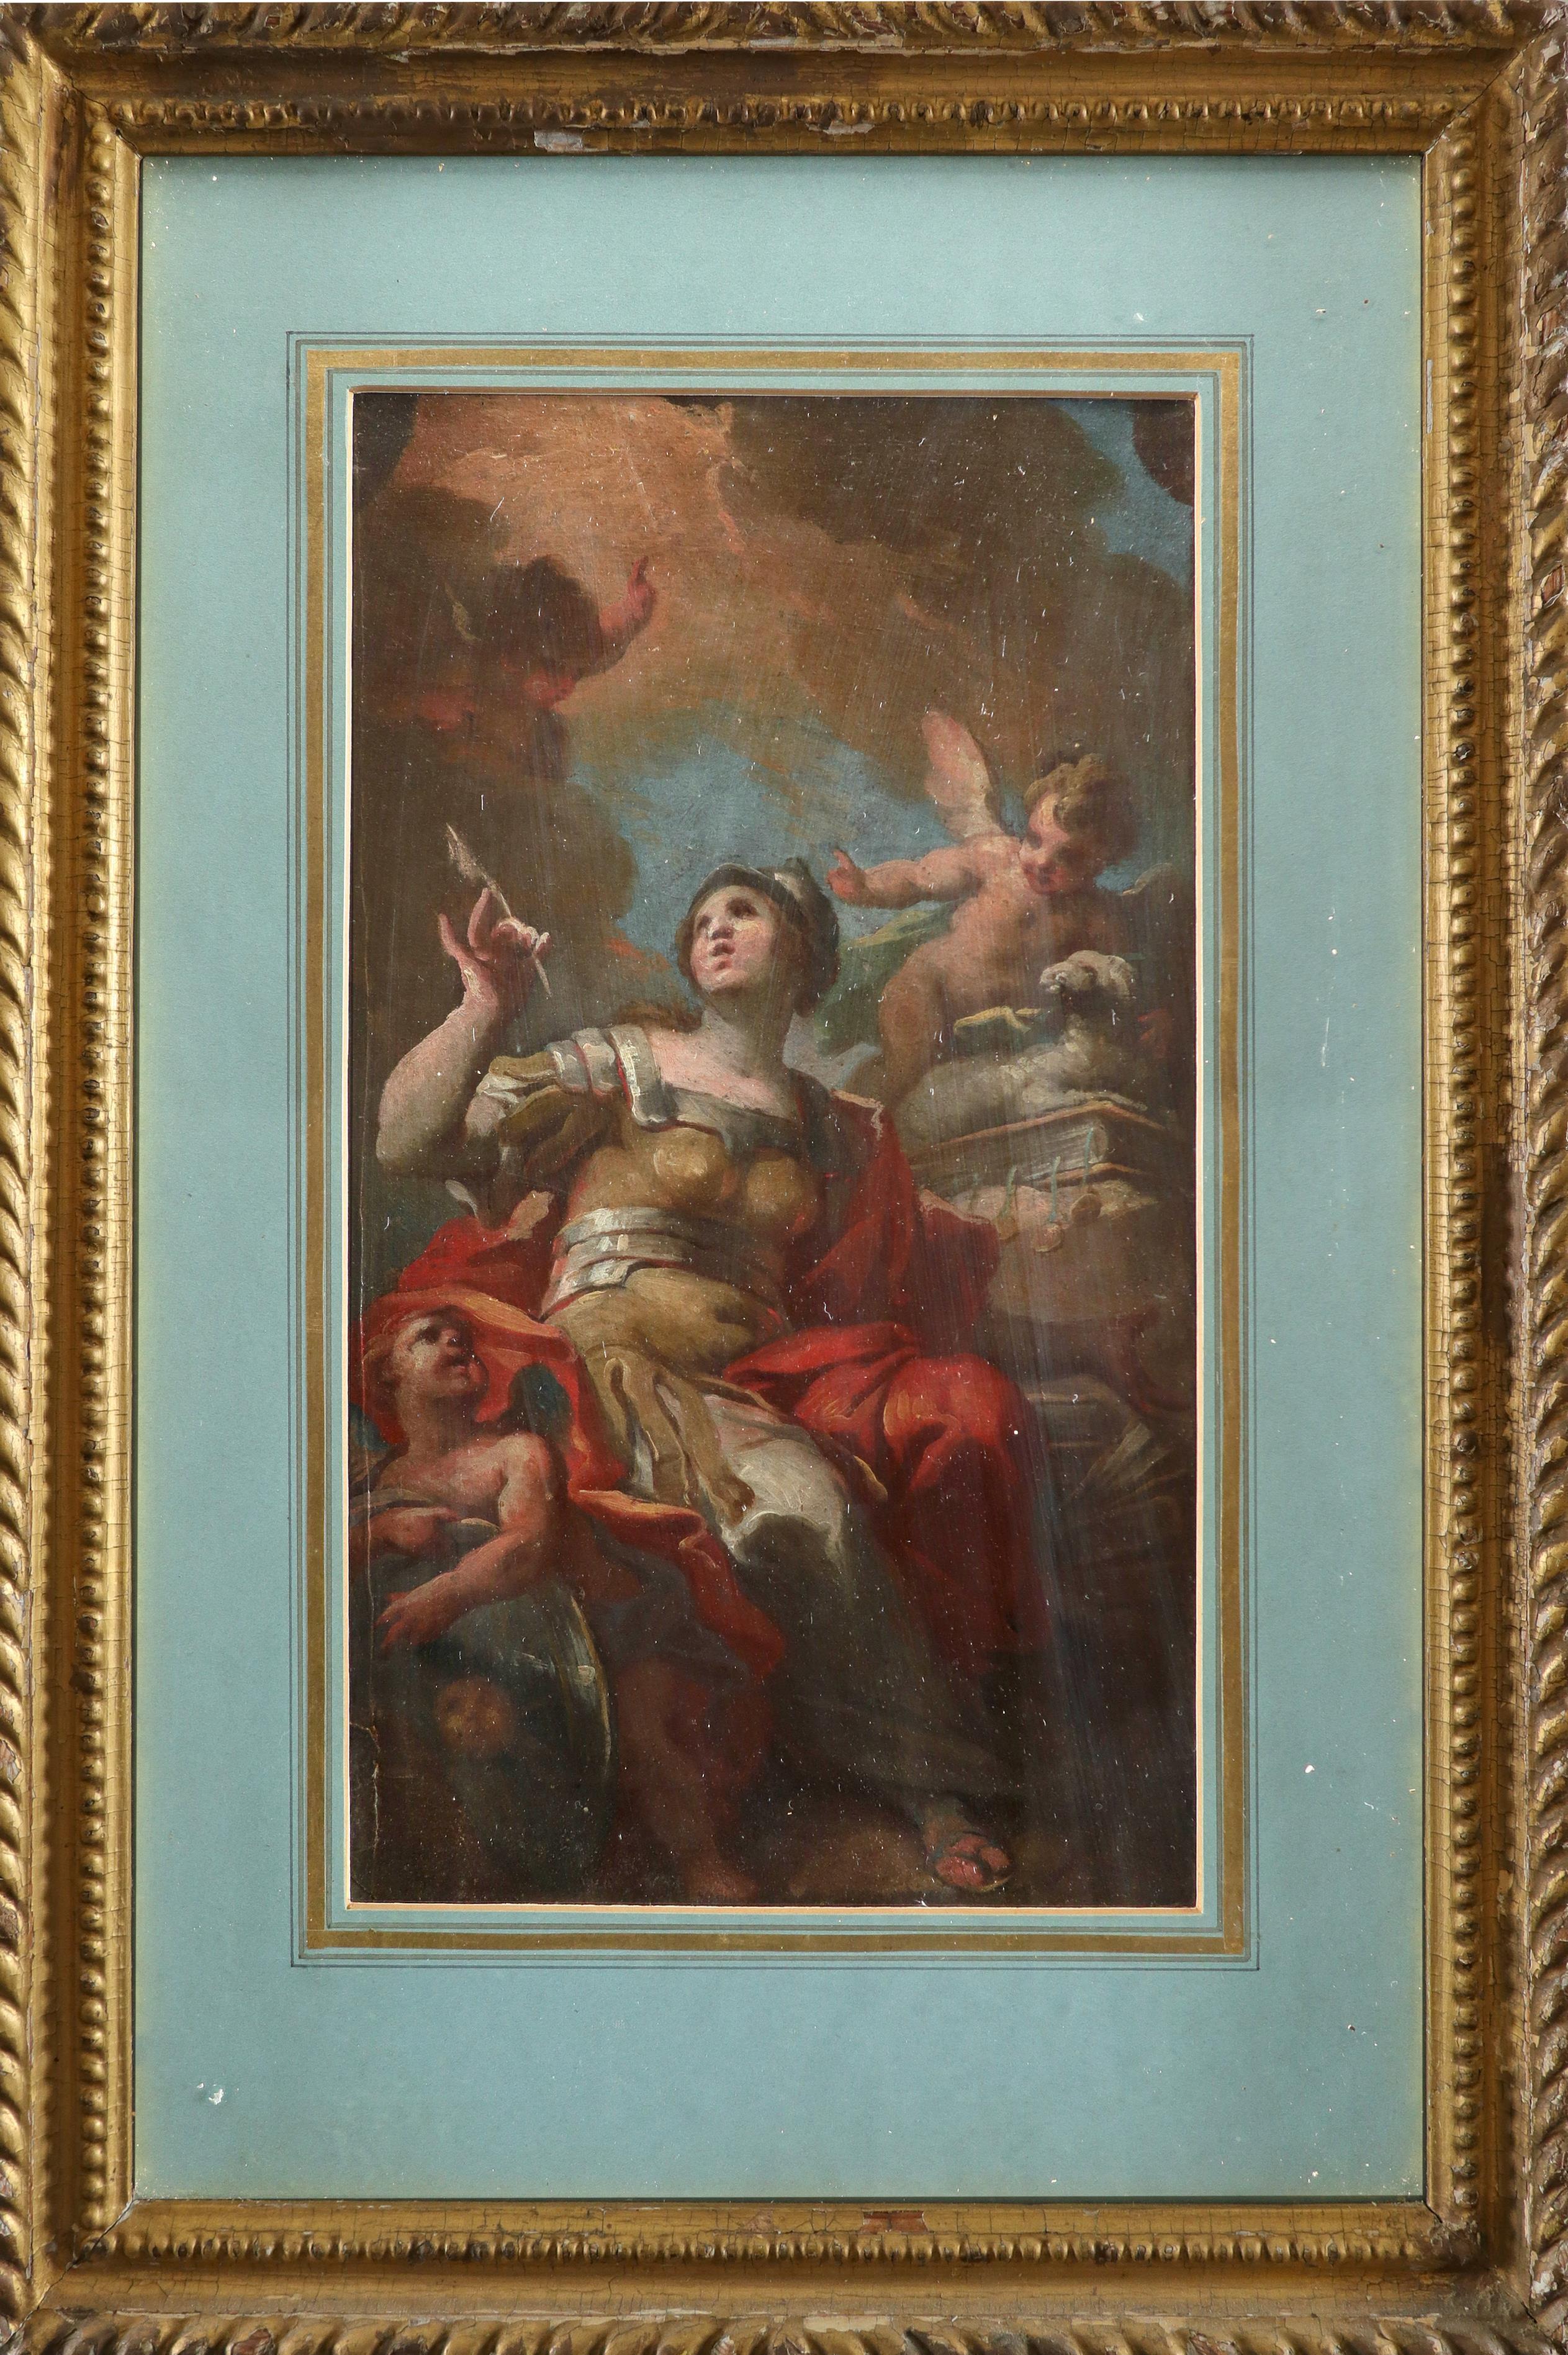 Corrado Giaquinto (Italian 1703-1766) Allegory of Divine Wisdom (Divina Sapienza) Oil on paper - Image 2 of 3